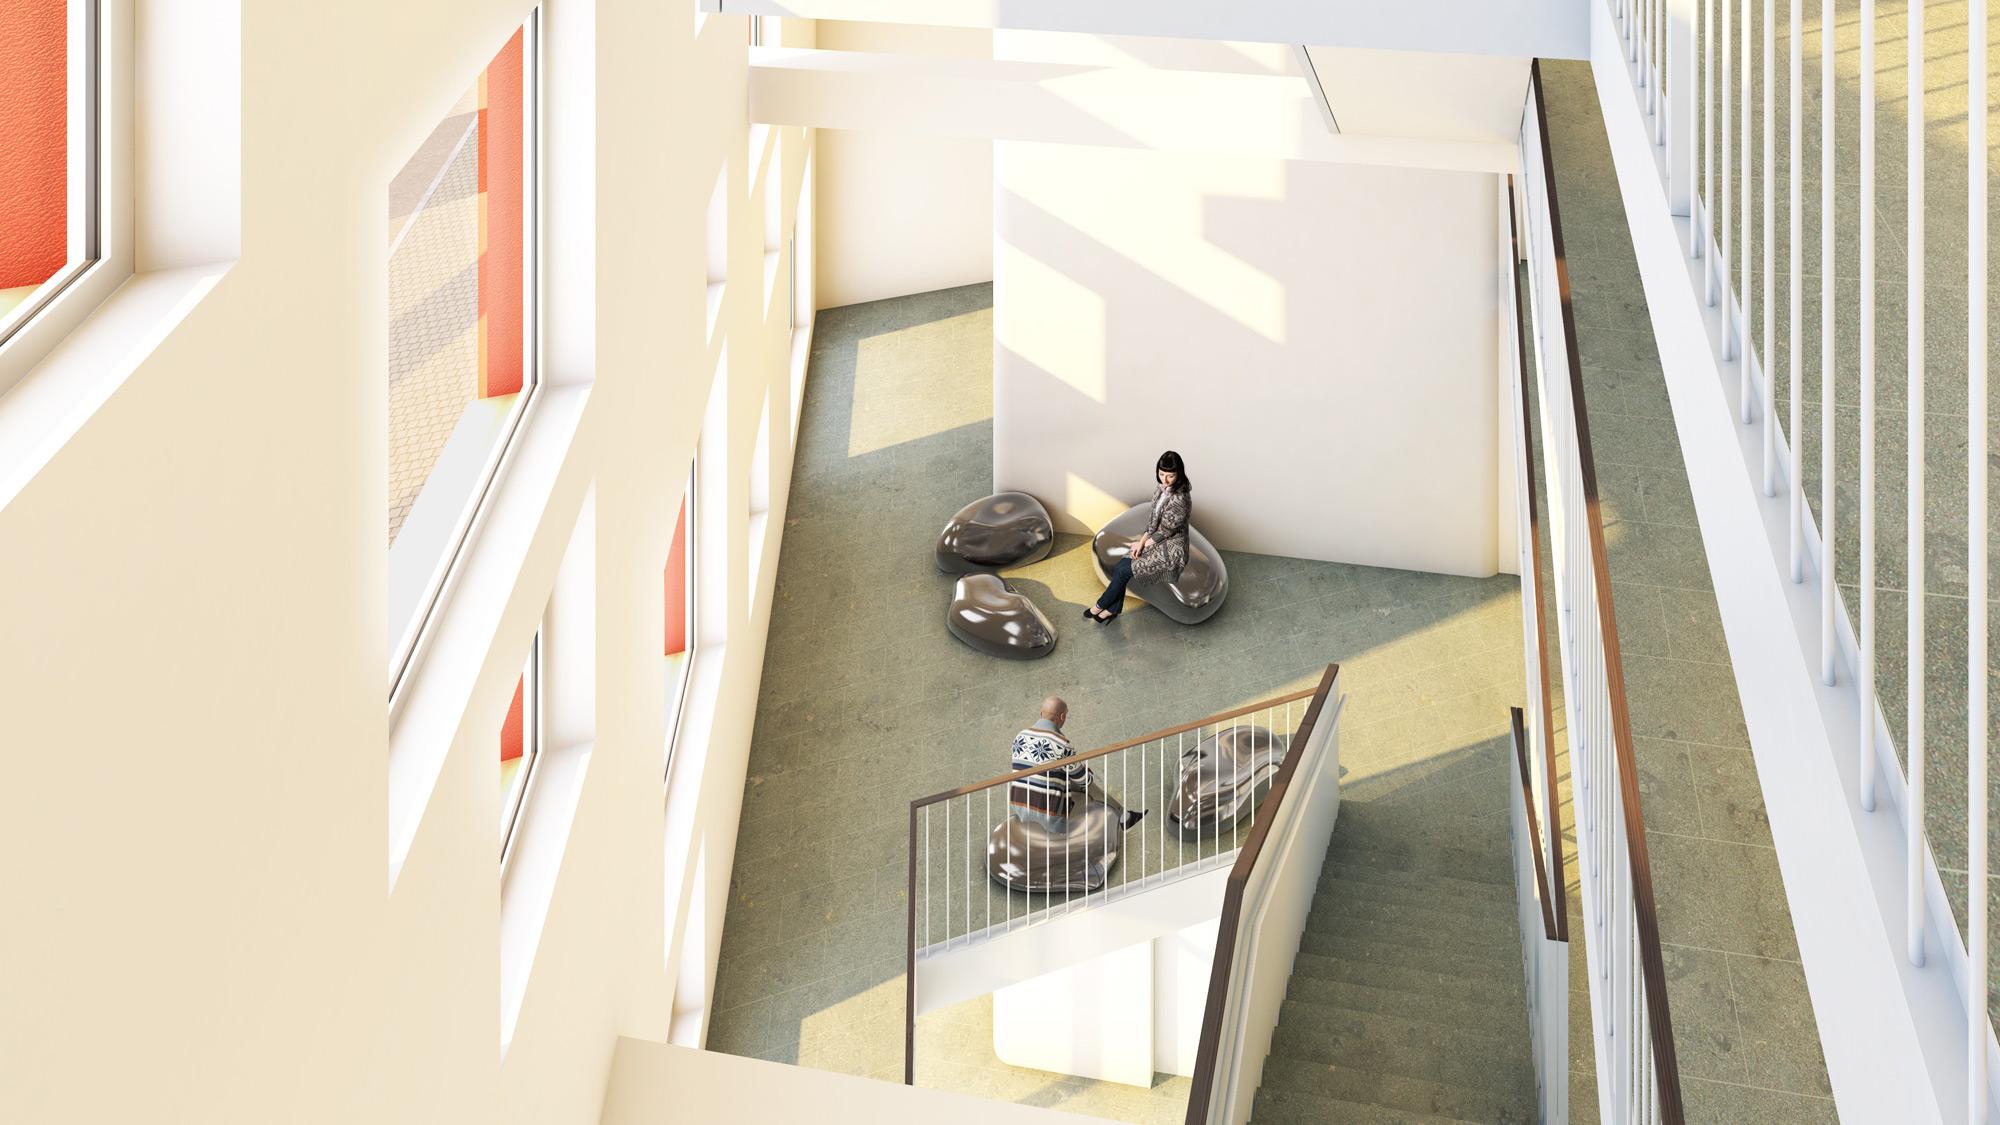 Visualisierung - Ansicht Treppenhaus - studiosus 5